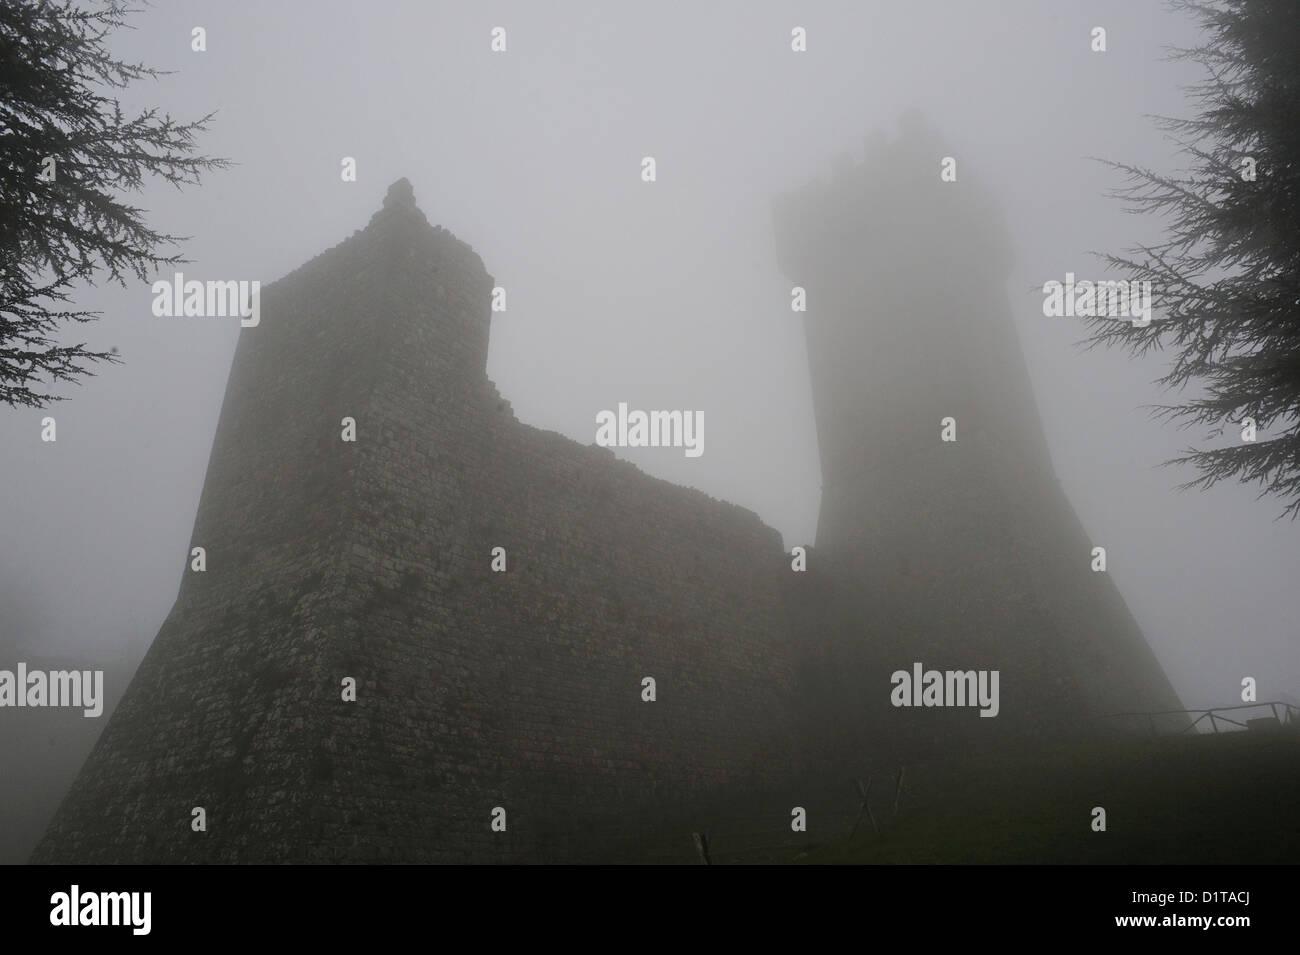 Radicofani medieval stronghold, Val d'Orcia, Siena, Tuscany, Italy - Stock Image